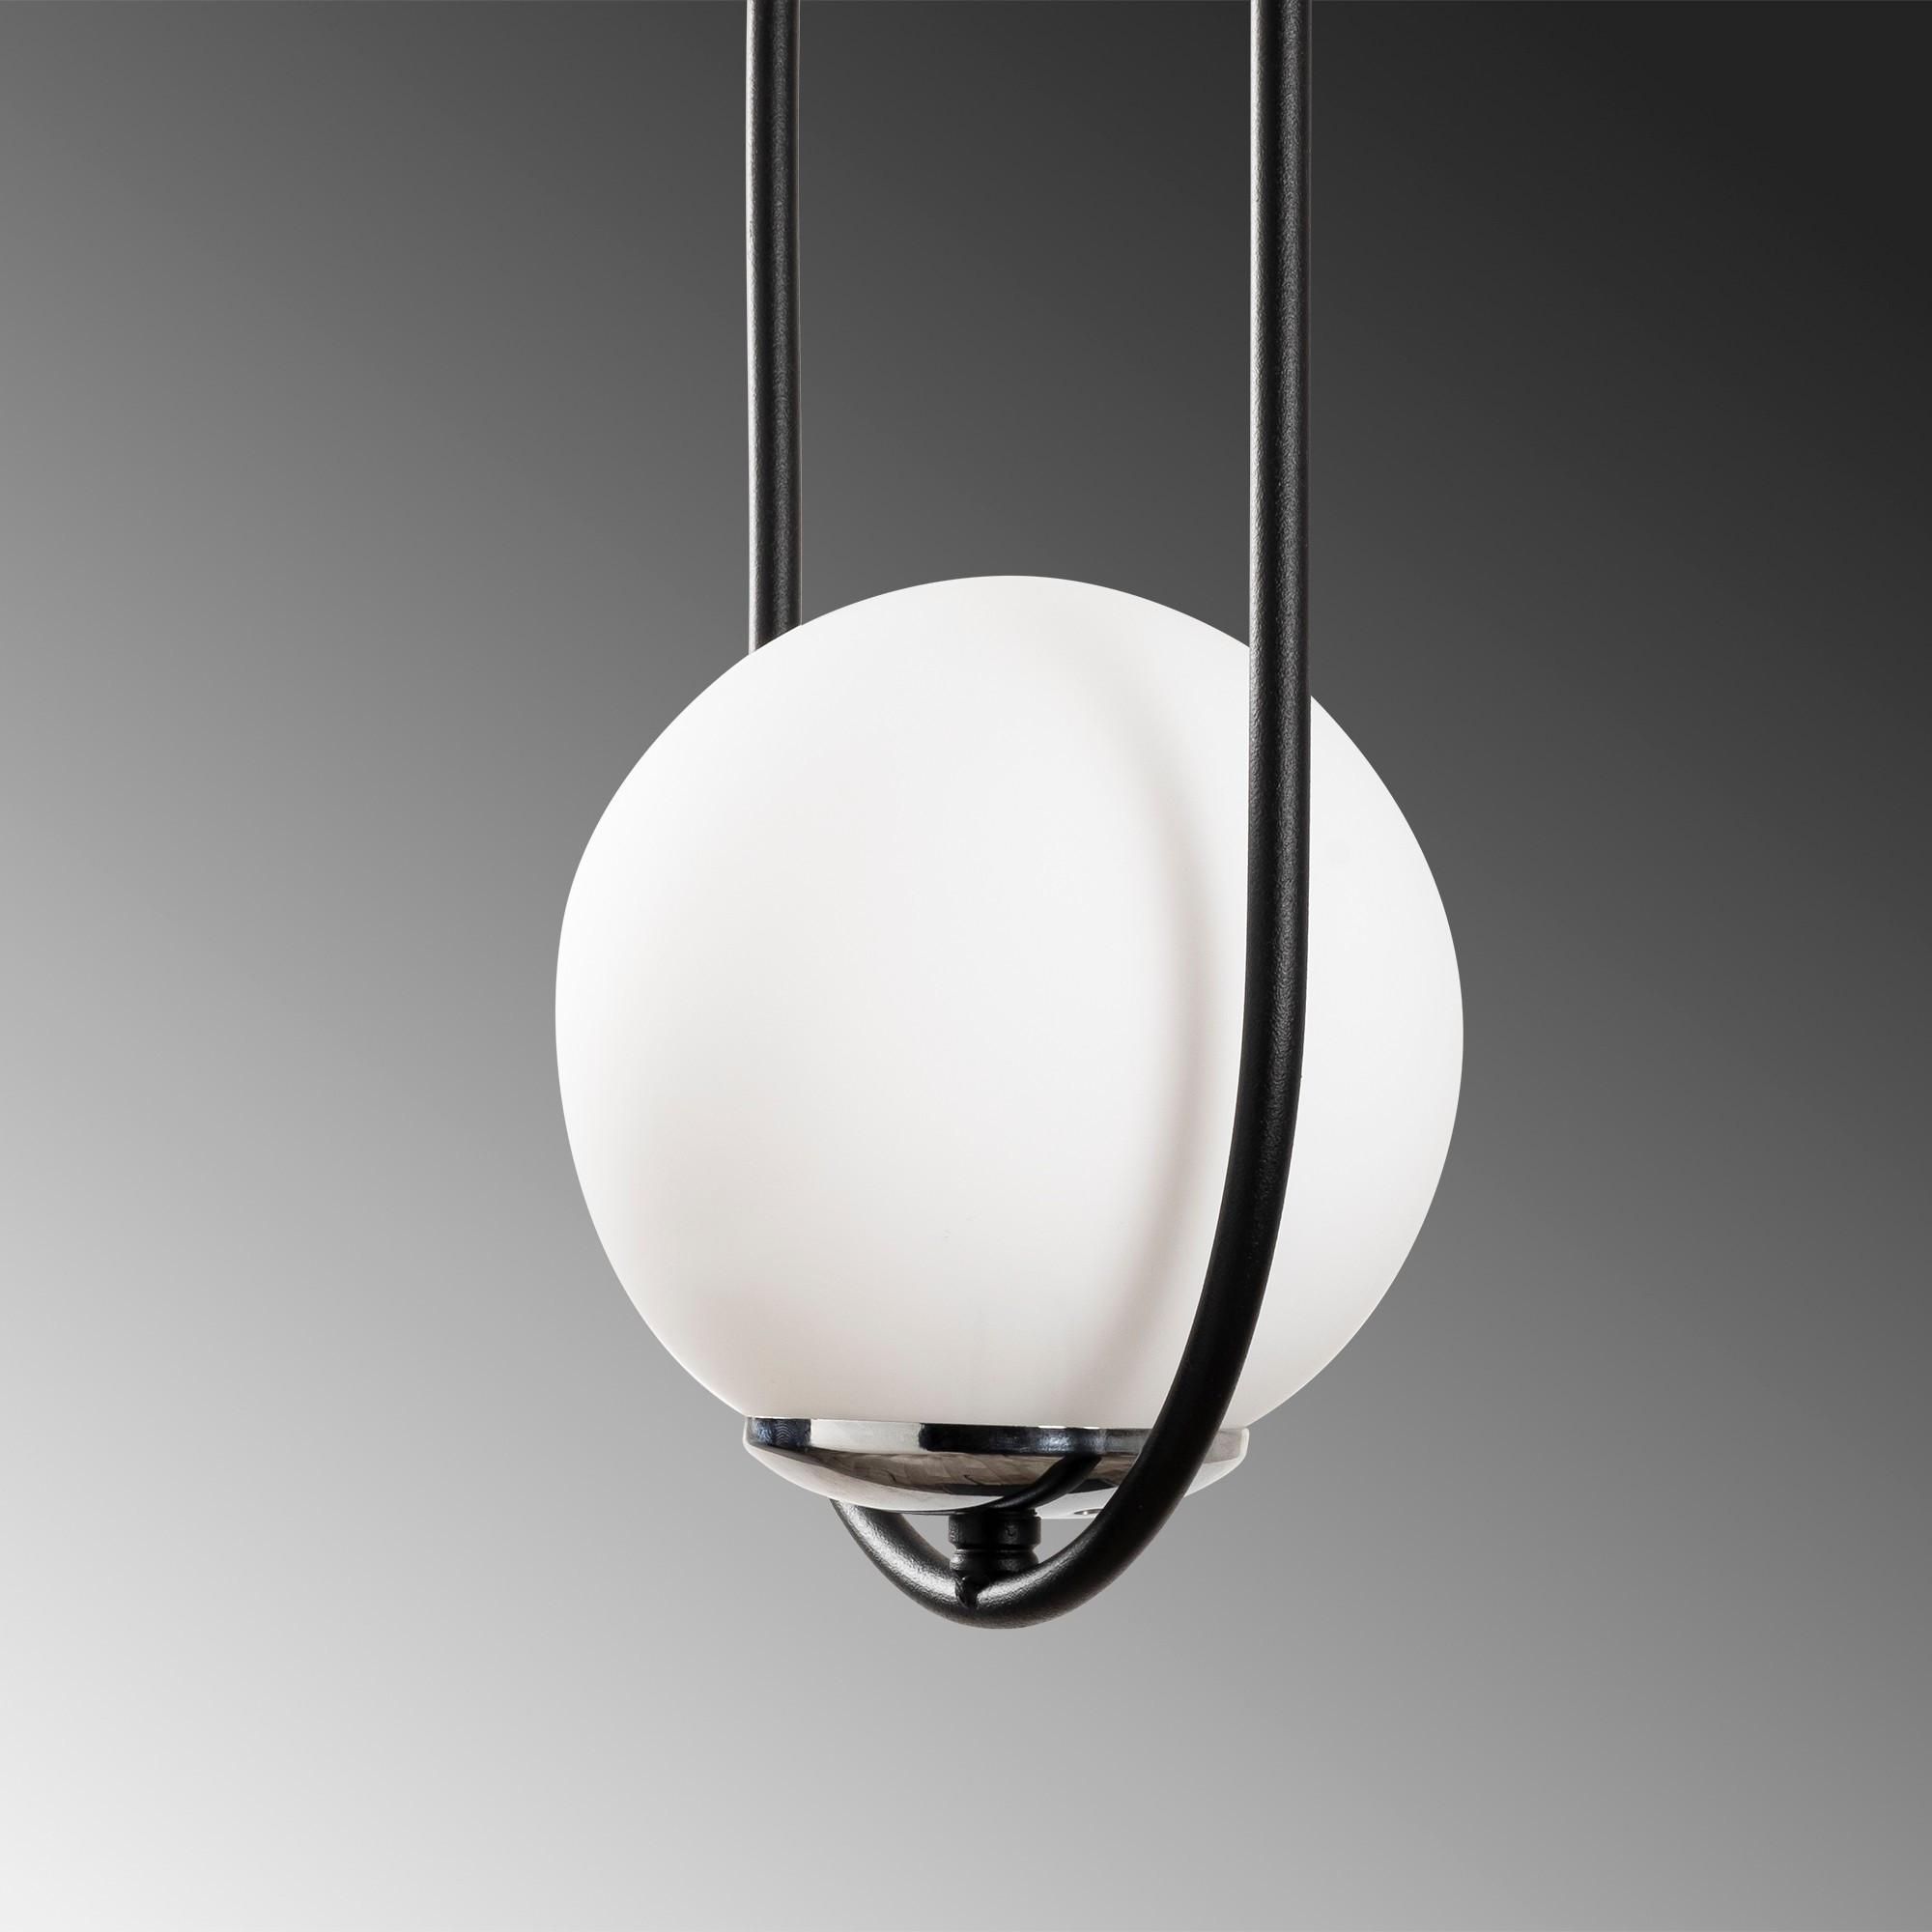 Pendant Lamp Mudoni MR 837